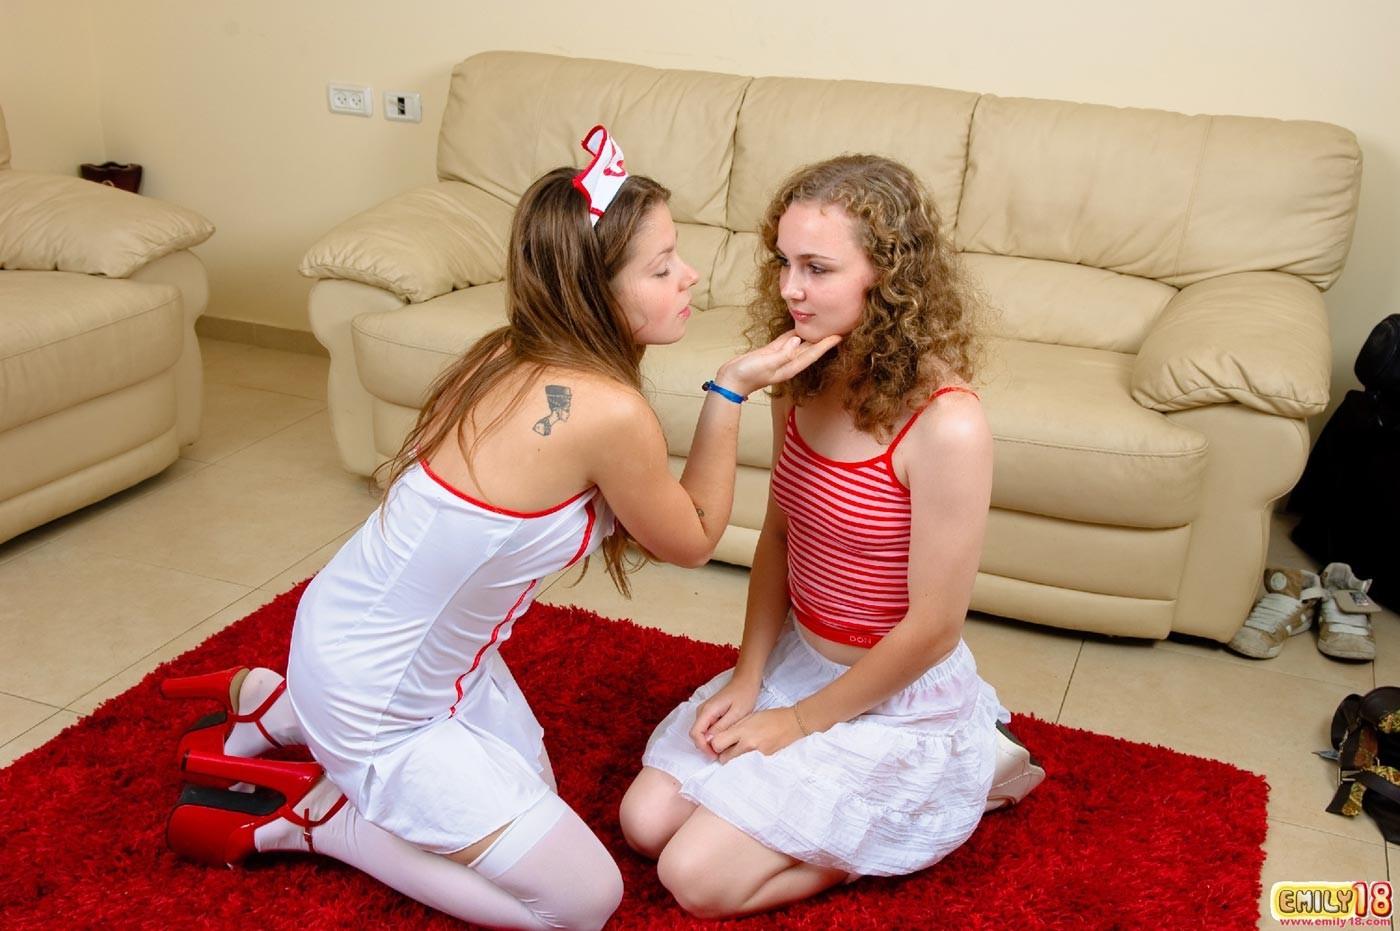 Emily - Медсестра - Порно галерея № 2553238